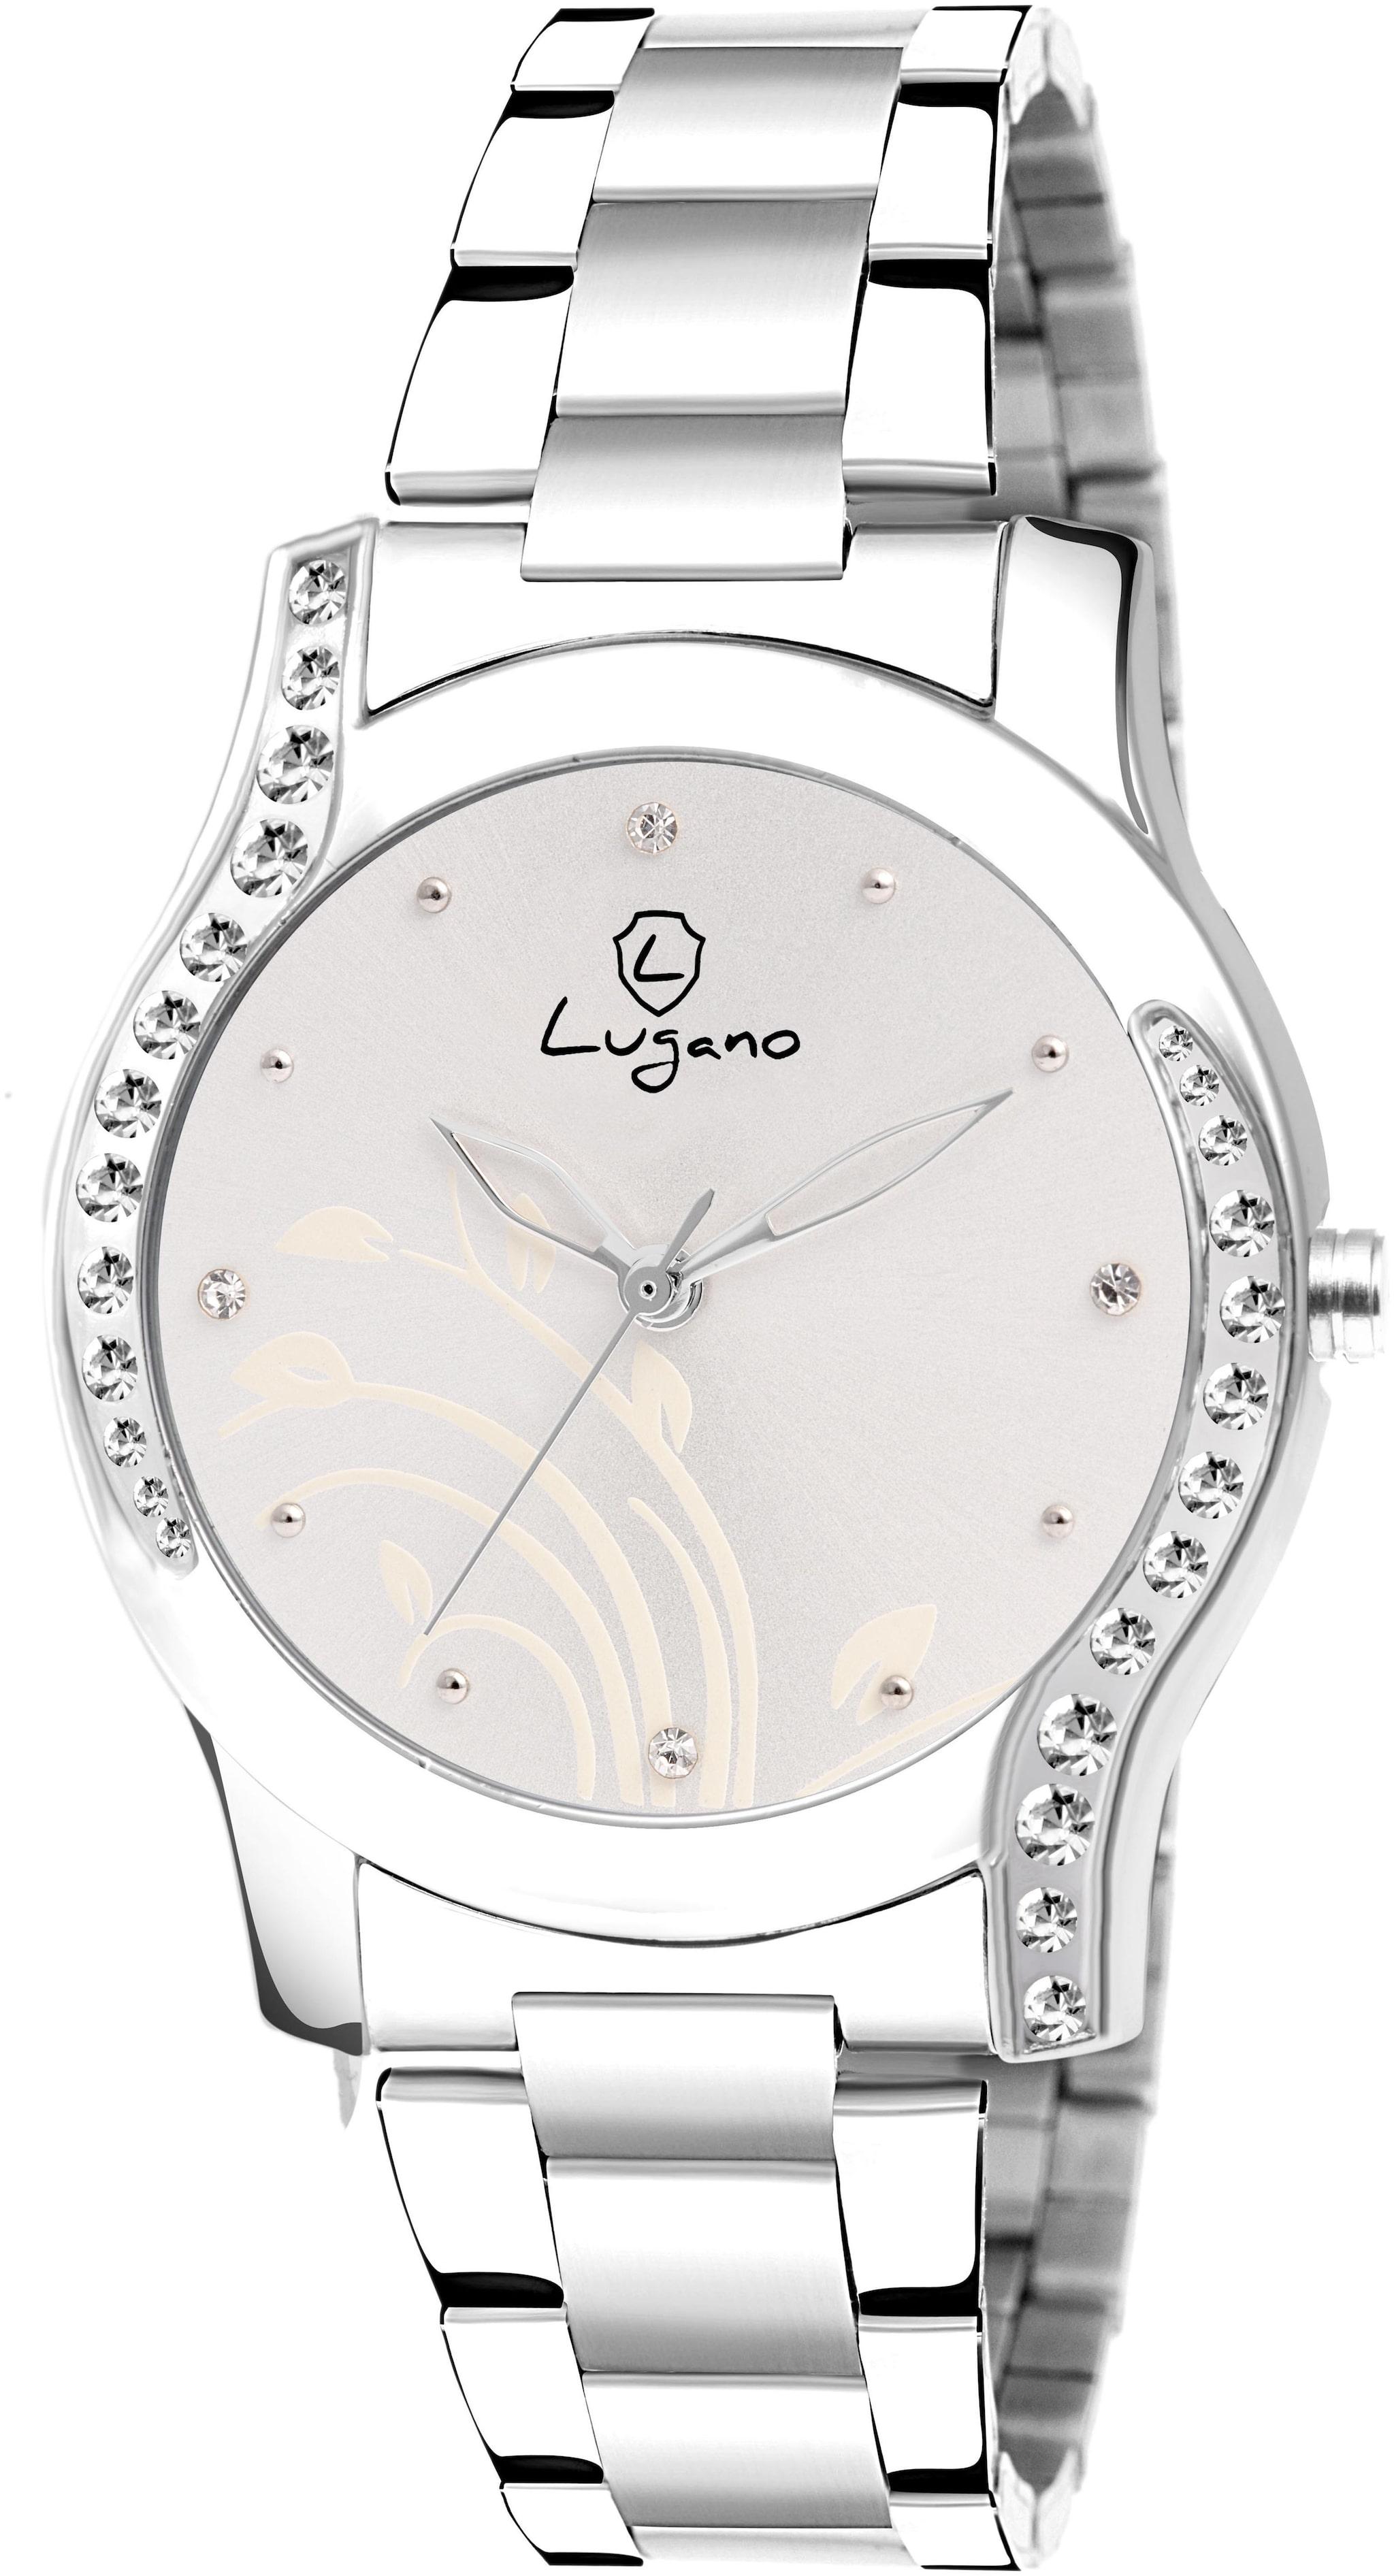 lugano LG 2089 Women Silver Analog Watch by Disha Enterprises